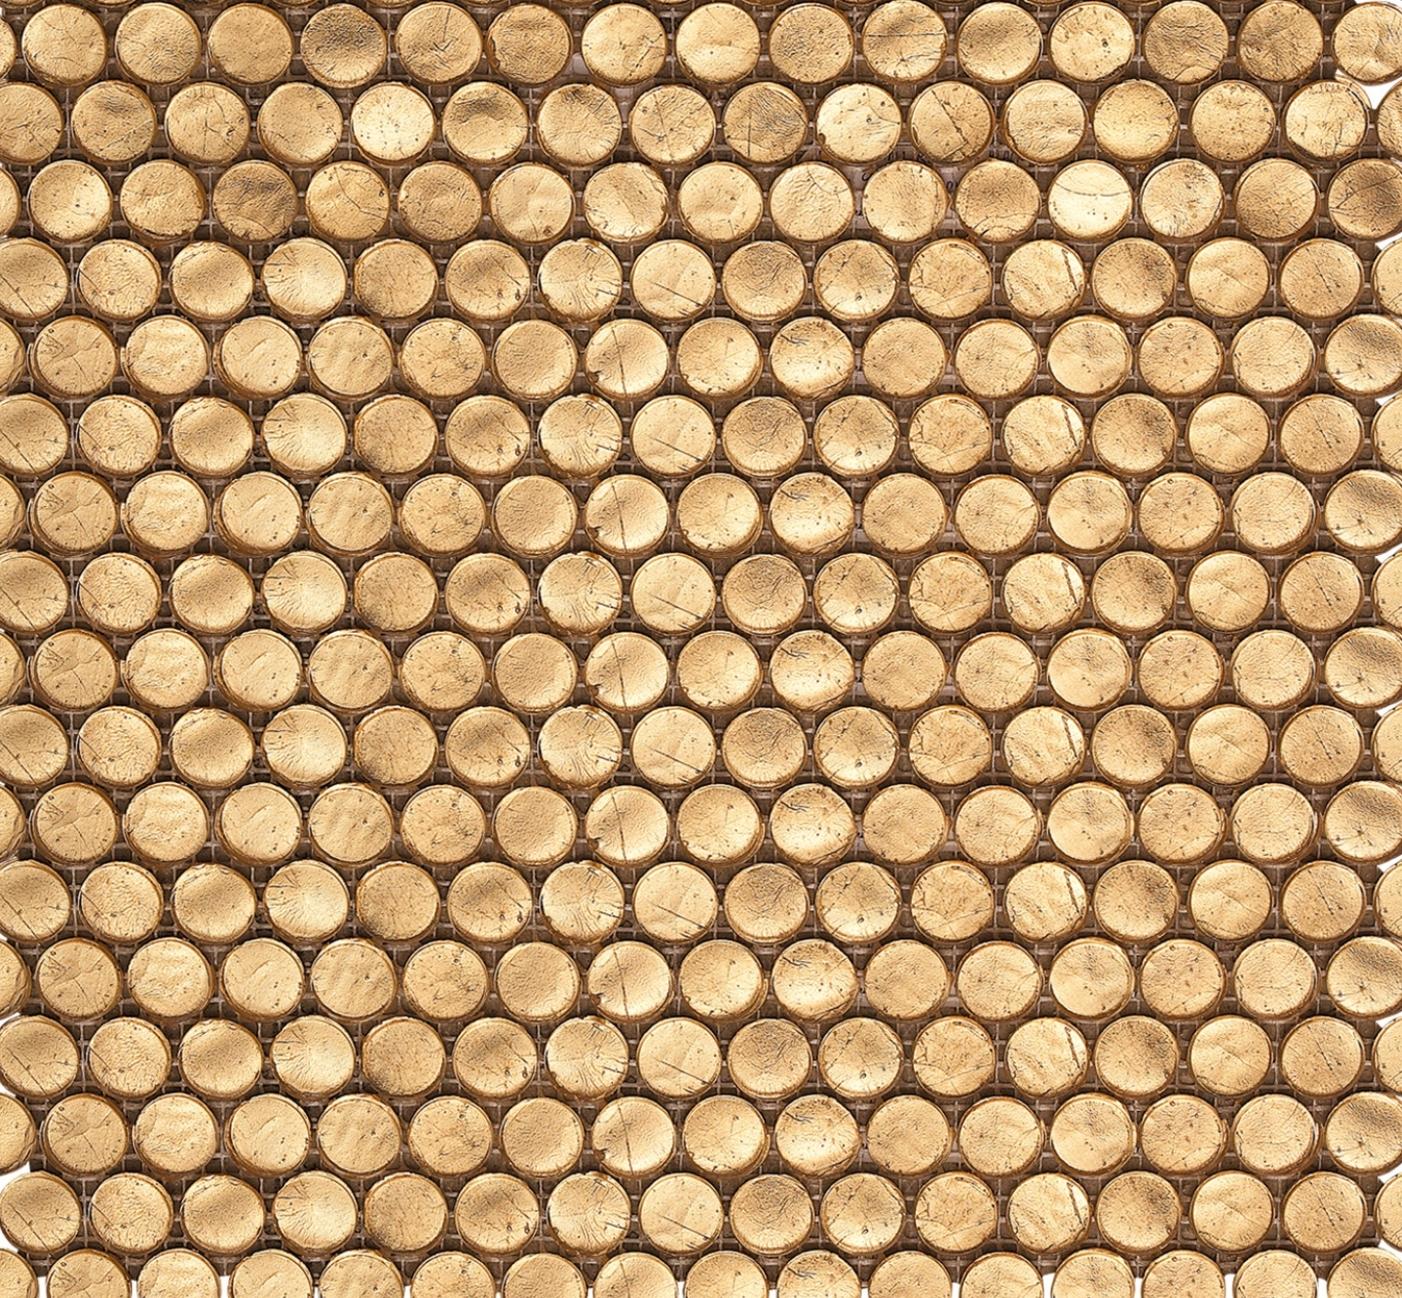 Interglass Penny Round Gold